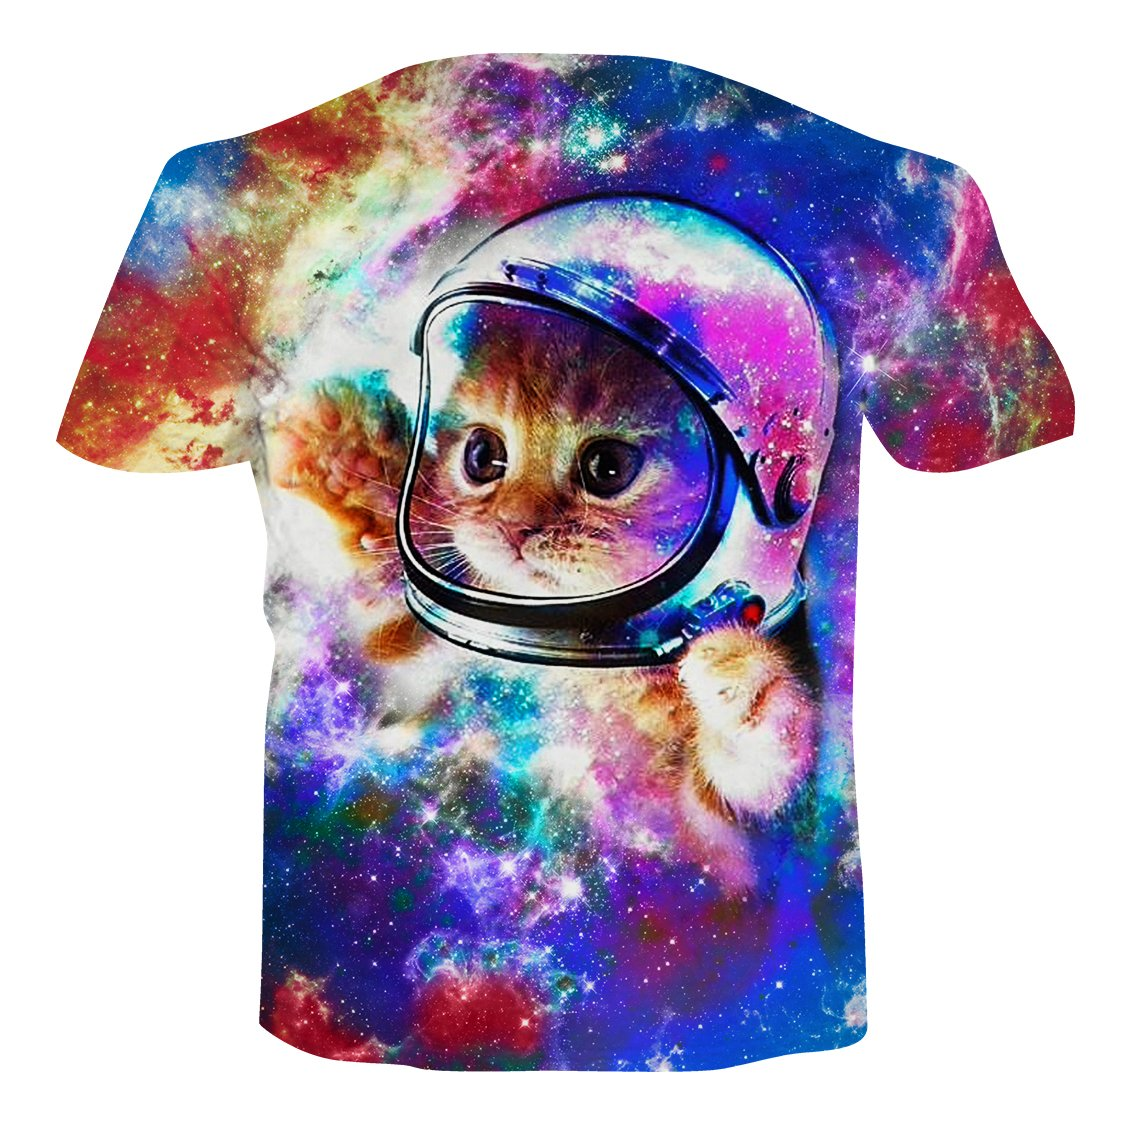 b00ca6d6d RAISEVERN Unisex Summer T-Shirts Crewneck Cool Short Sleeve Funny Graphic  Print Top Casual Tees   Amazon.com